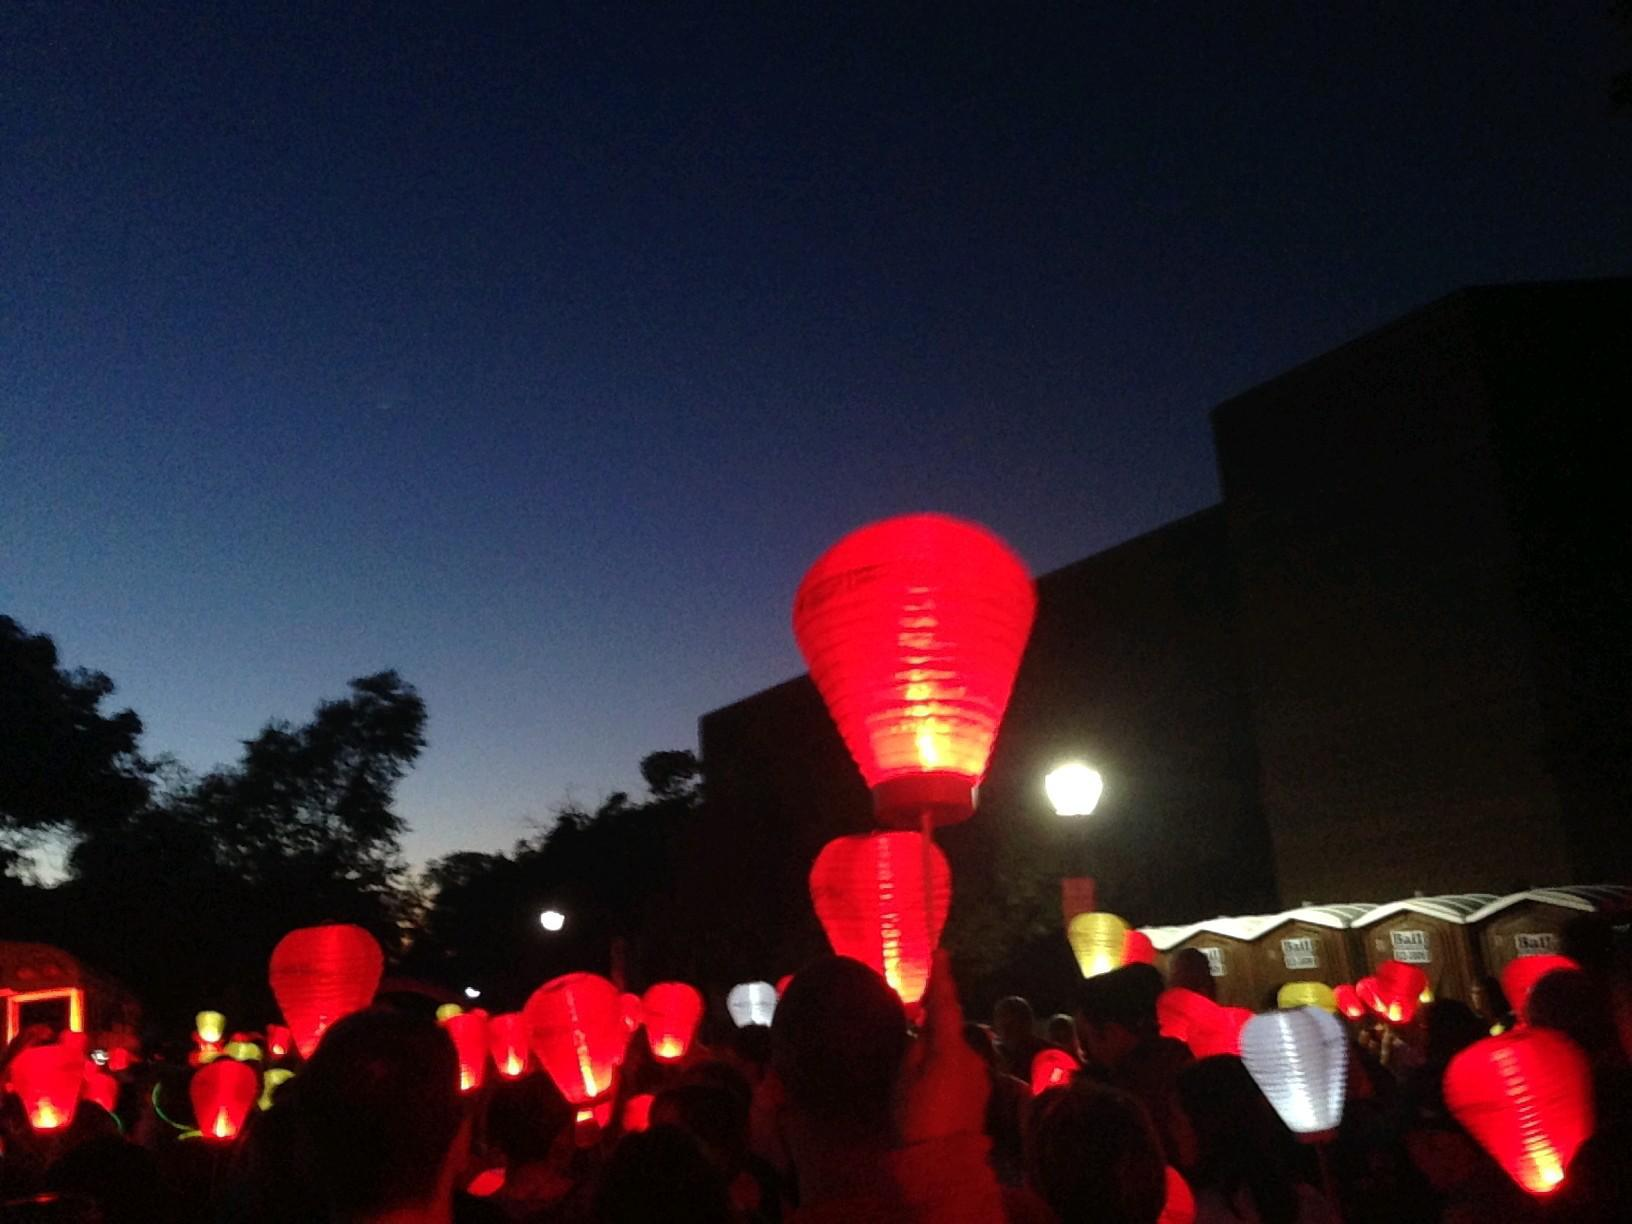 Lanterns will help bring meaning to the Leukemia & Lymphoma Society Light the Night Walk Friday in Delaware Park. (Buffalo News file photo)